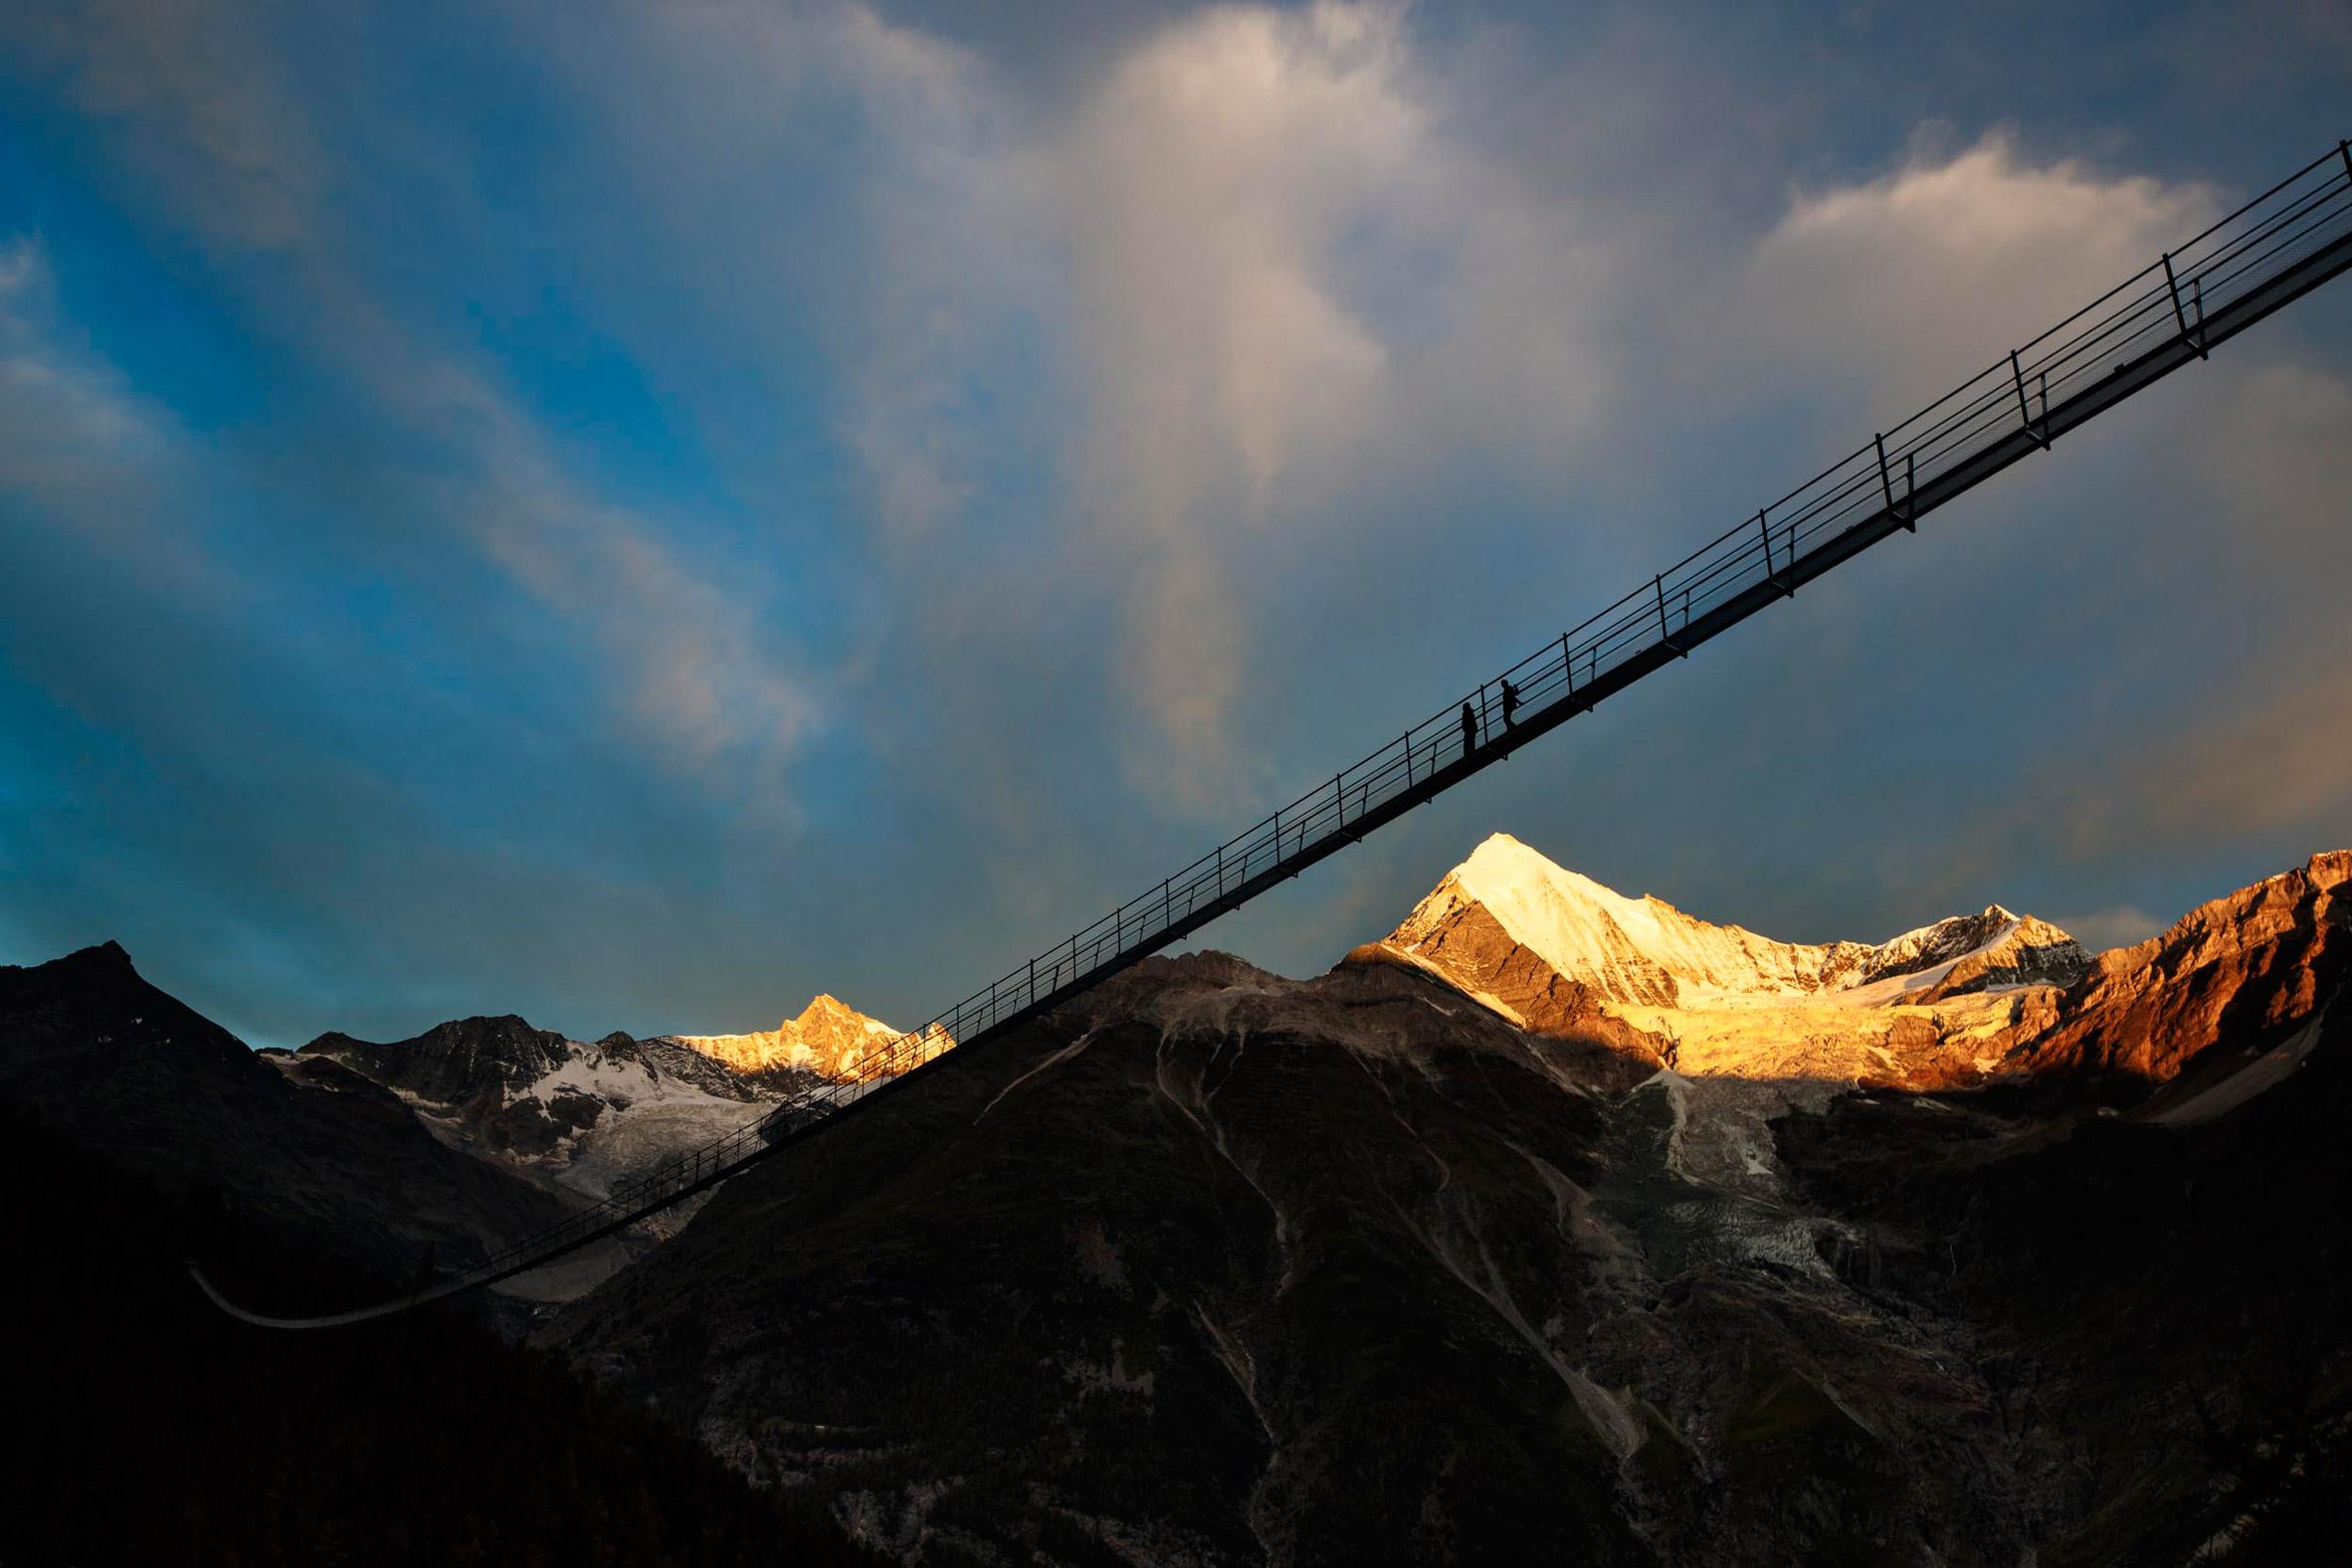 Charles Kuonen Suspension Bridge by Swissrope